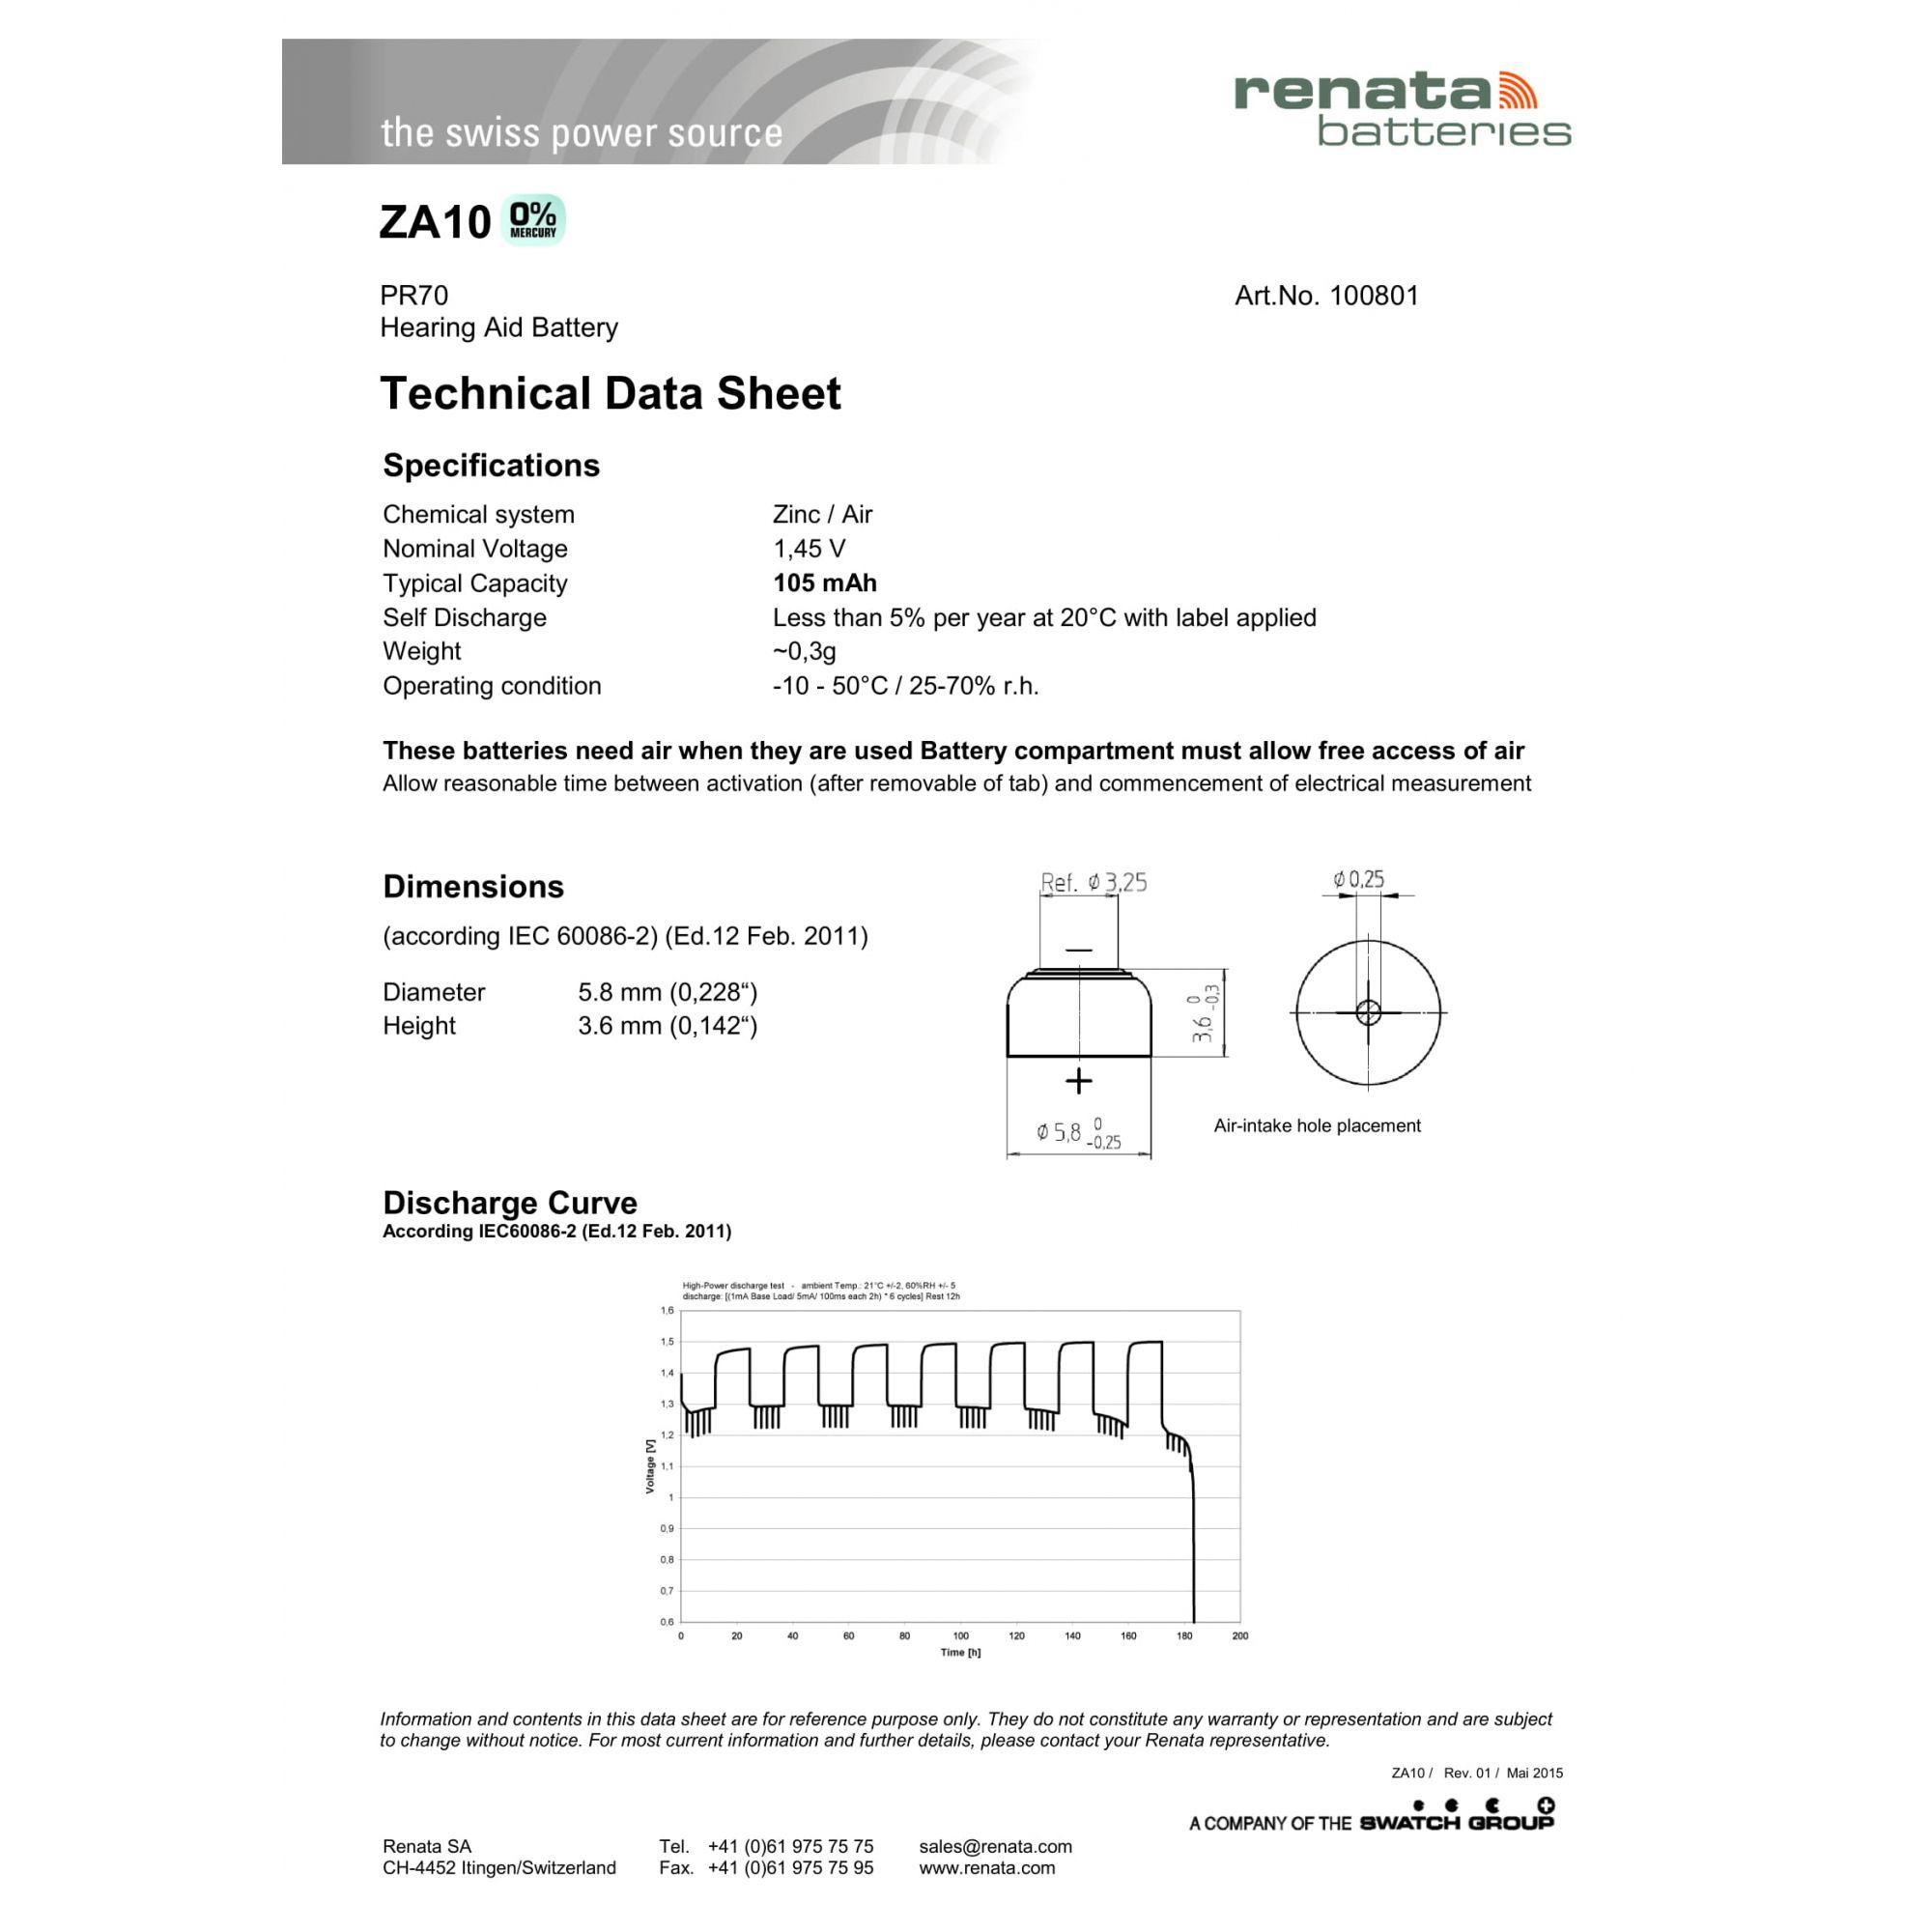 120 Baterias Pilhas Auditiva 10 RENATA ZA10 - 20 cartelas